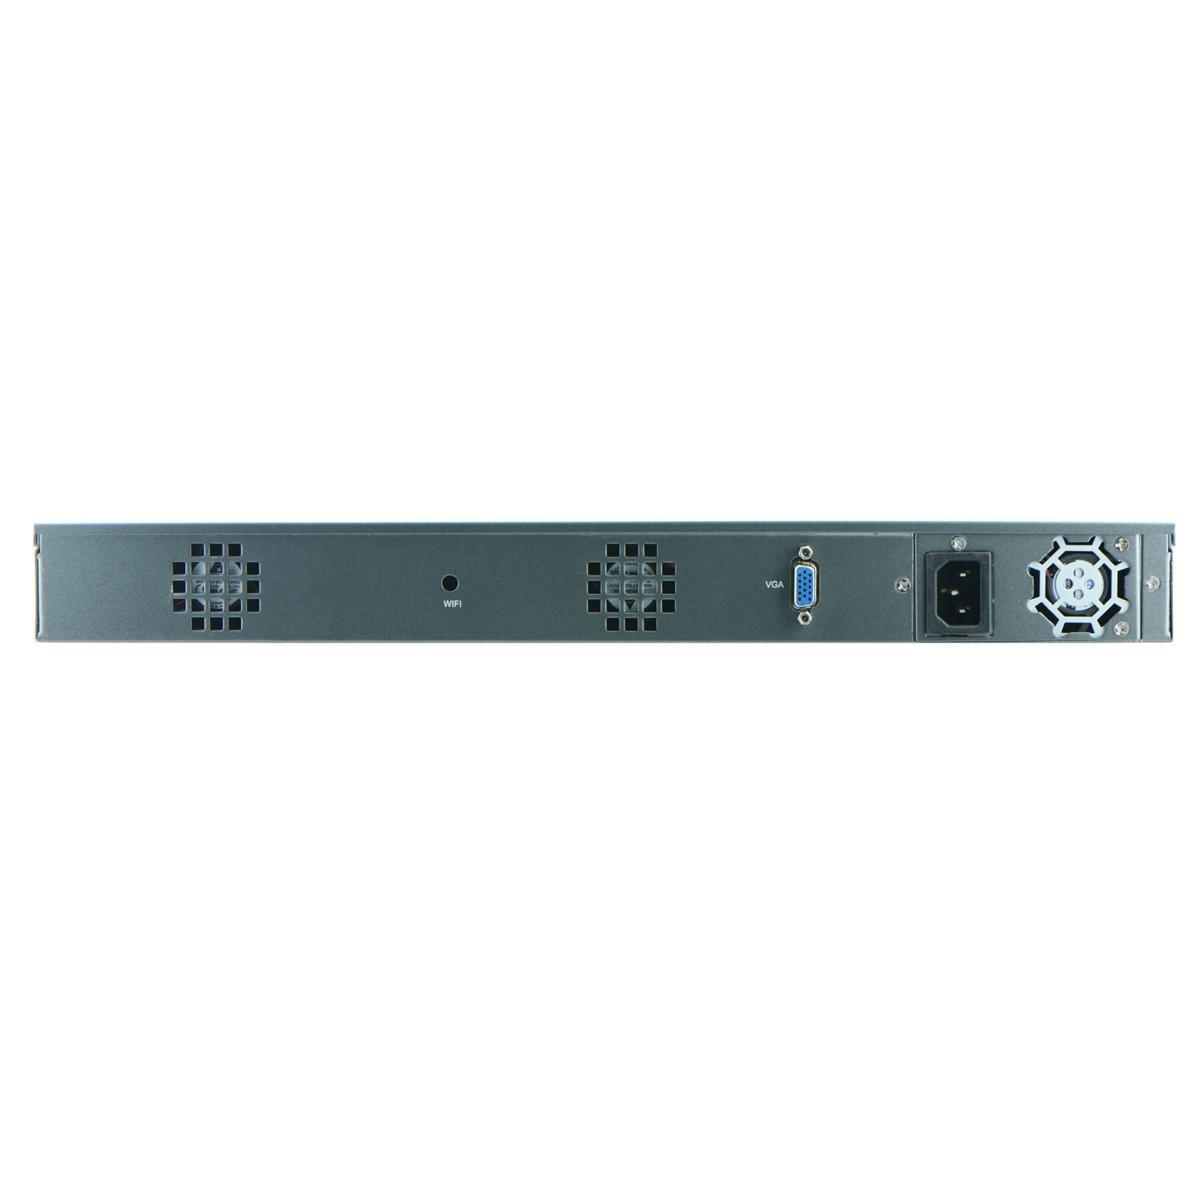 1U B75 Industrial Rackmount Barebone for Network Security 6 Nic SFP 3